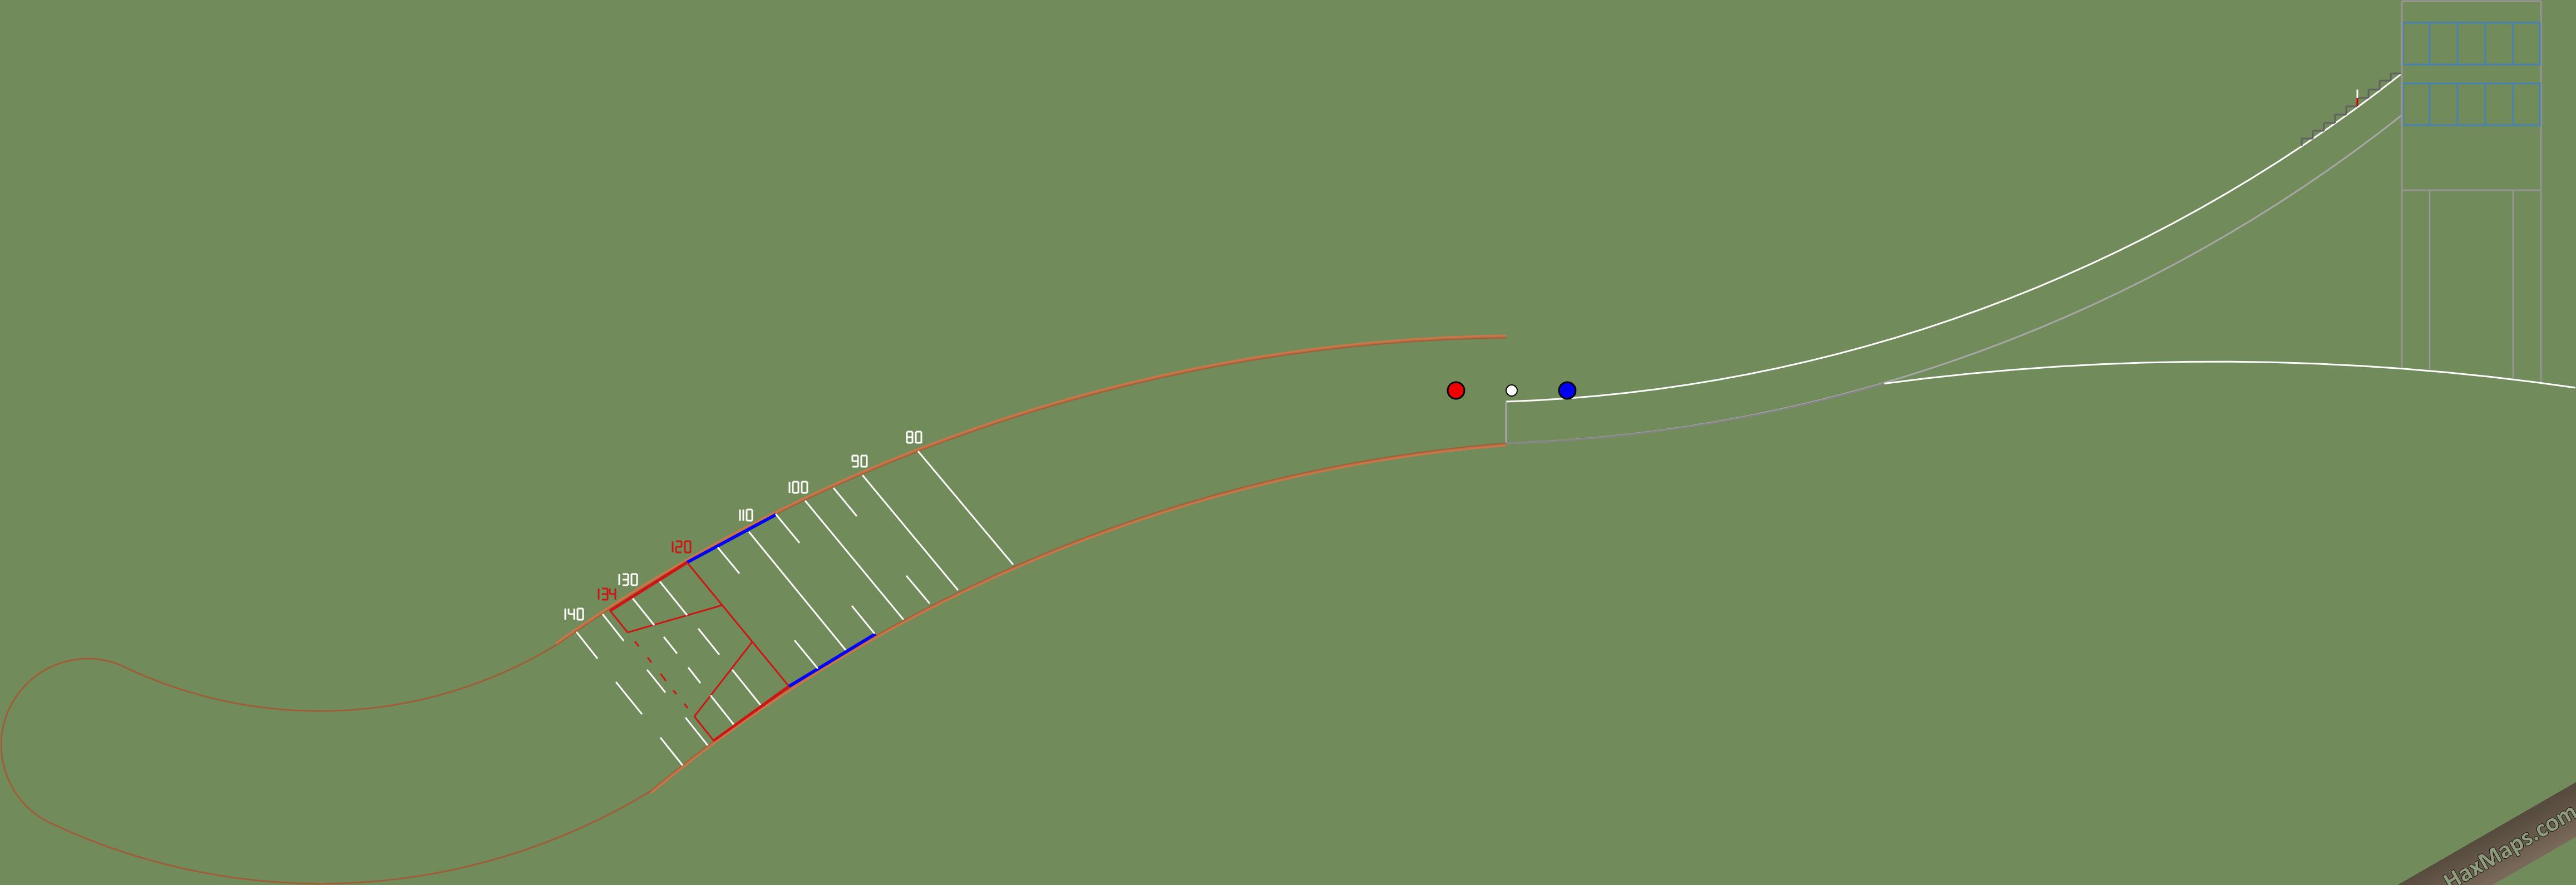 HaxMap: NHL Joe Louis Arena 1G | HaxBall Maps